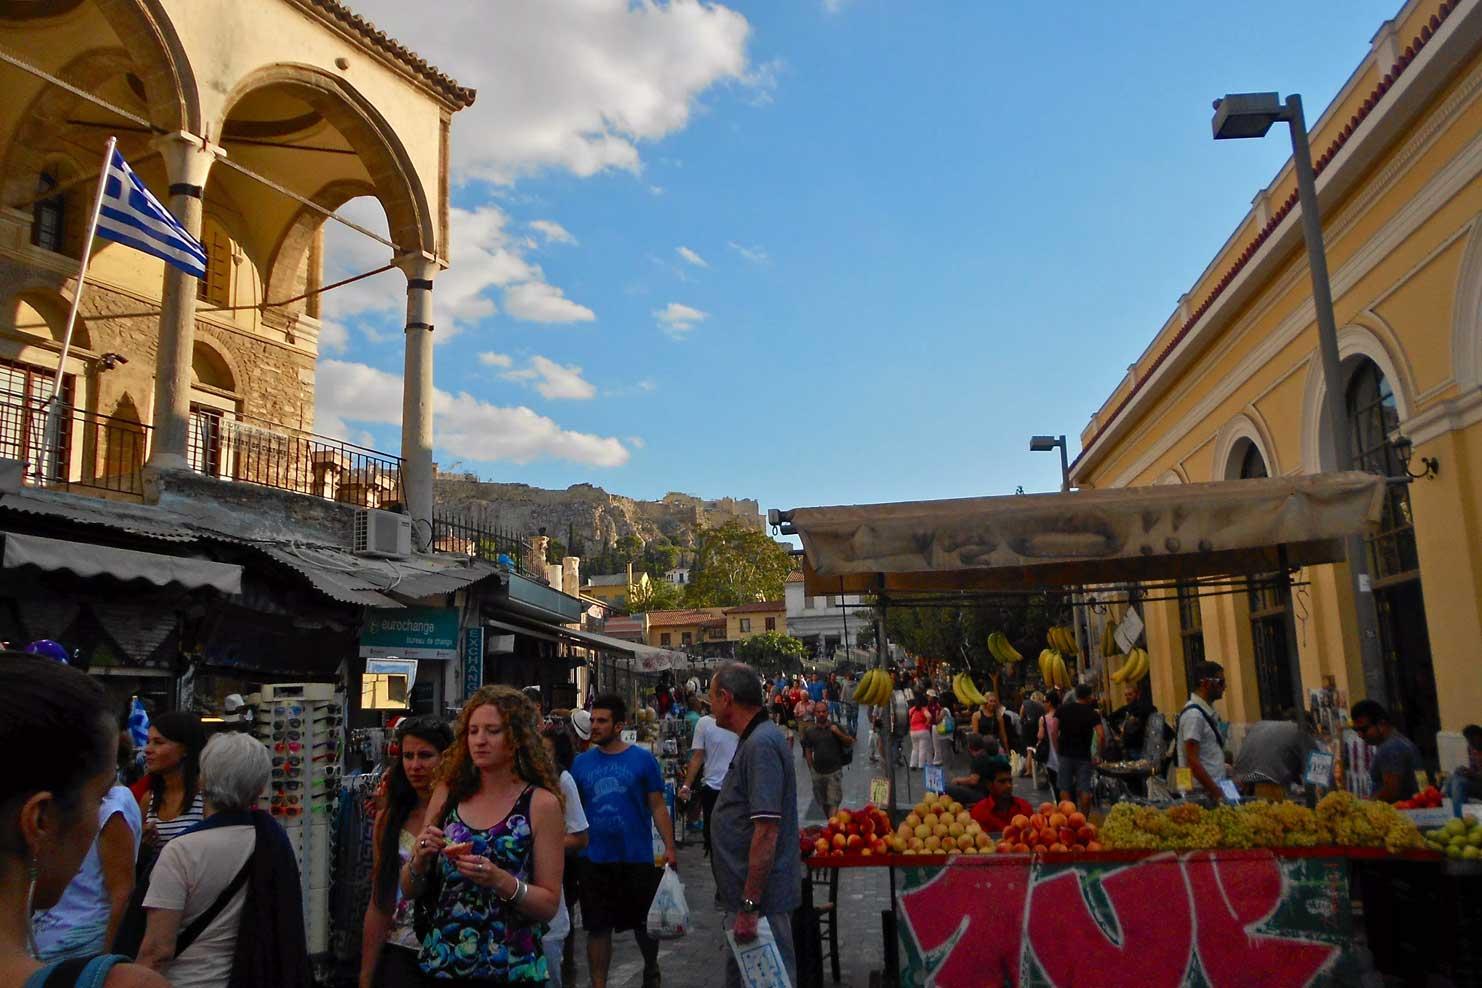 006-Athens-City-Stroll-&-Markets